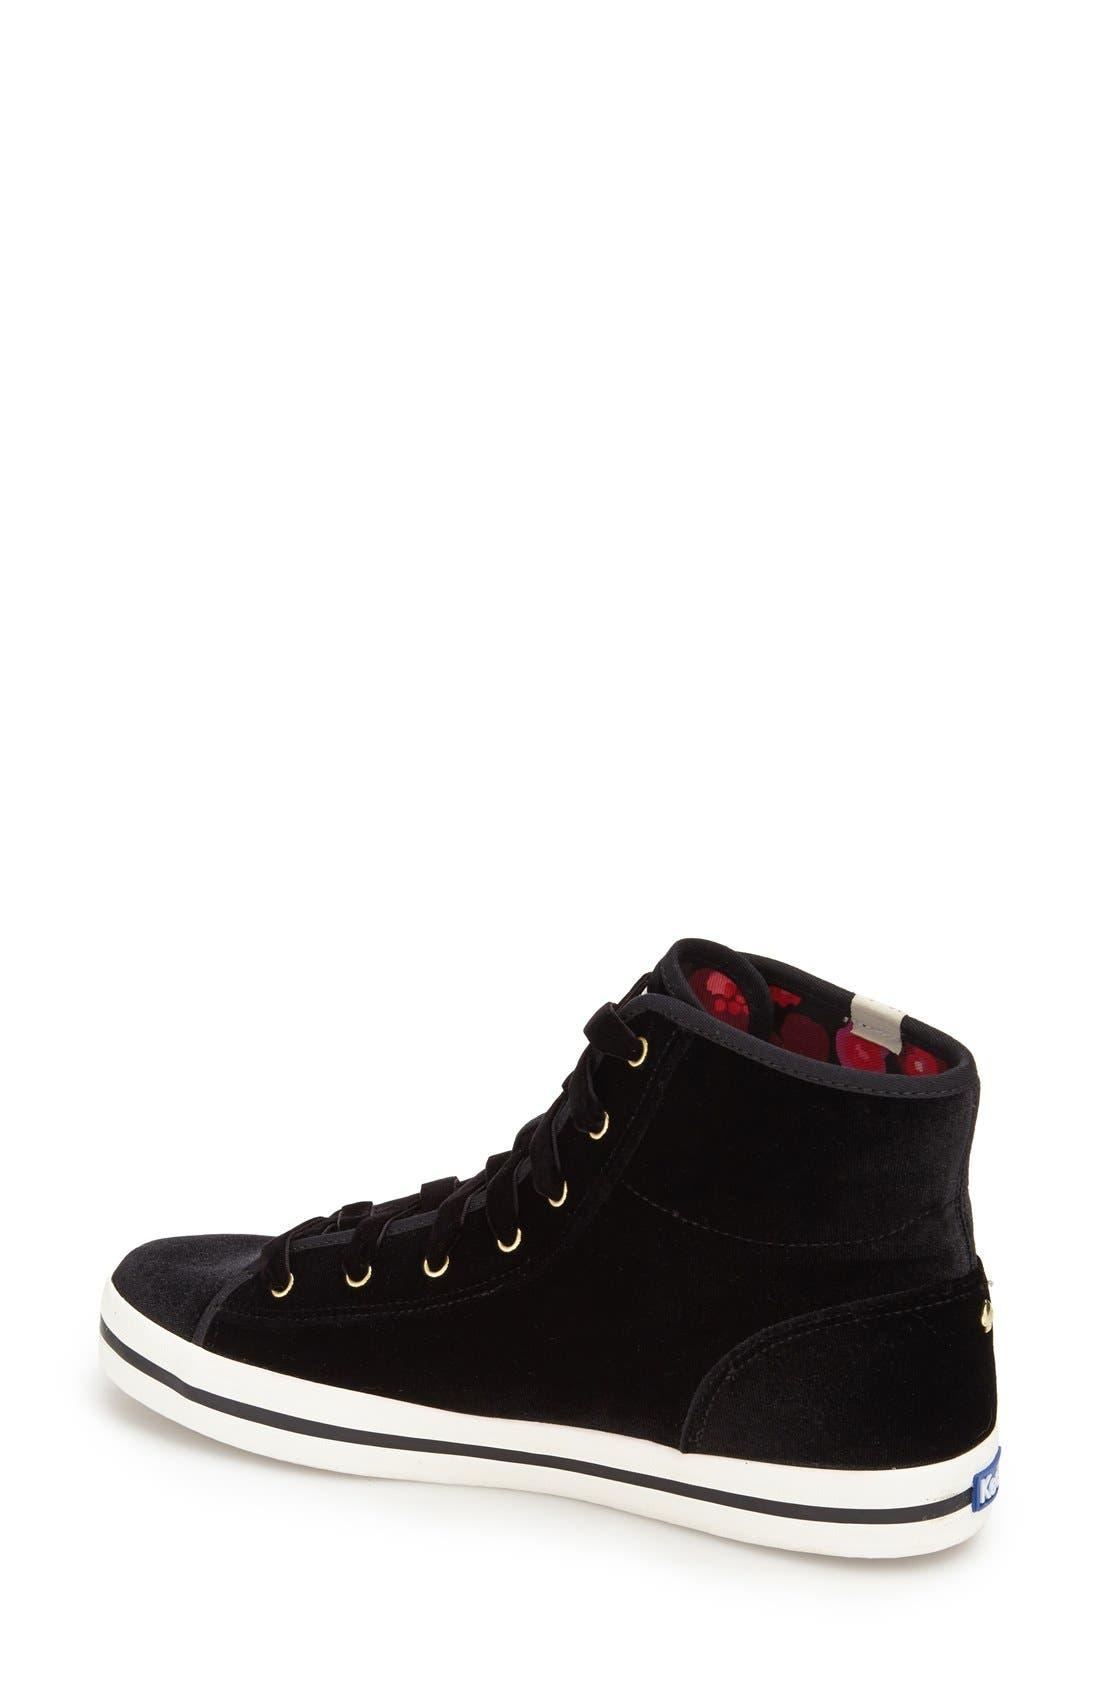 Alternate Image 2  - Keds® for kate spade new york 'dori' high top sneaker (Women)